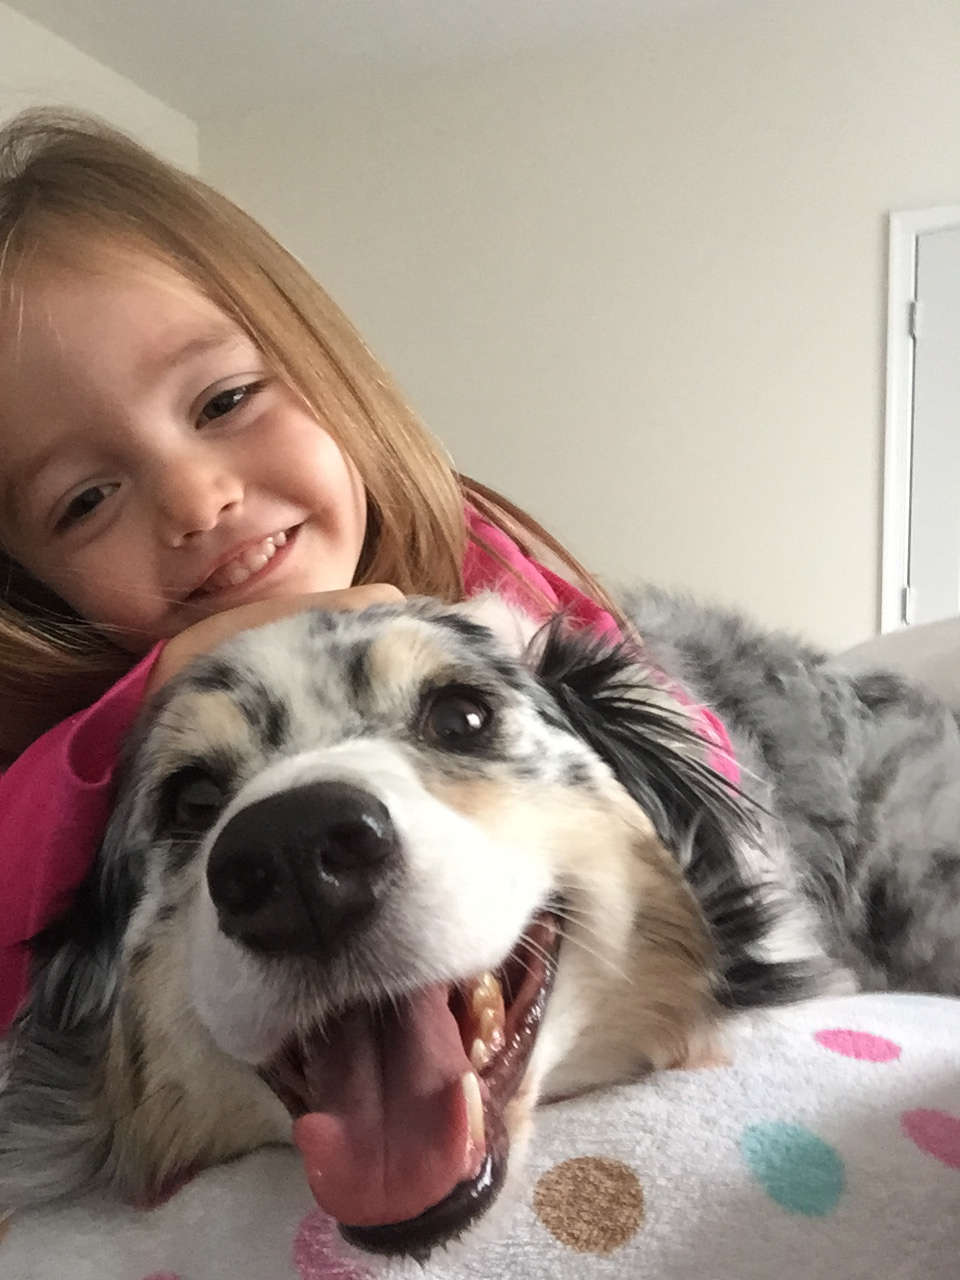 Kasha and her little human, Gracie